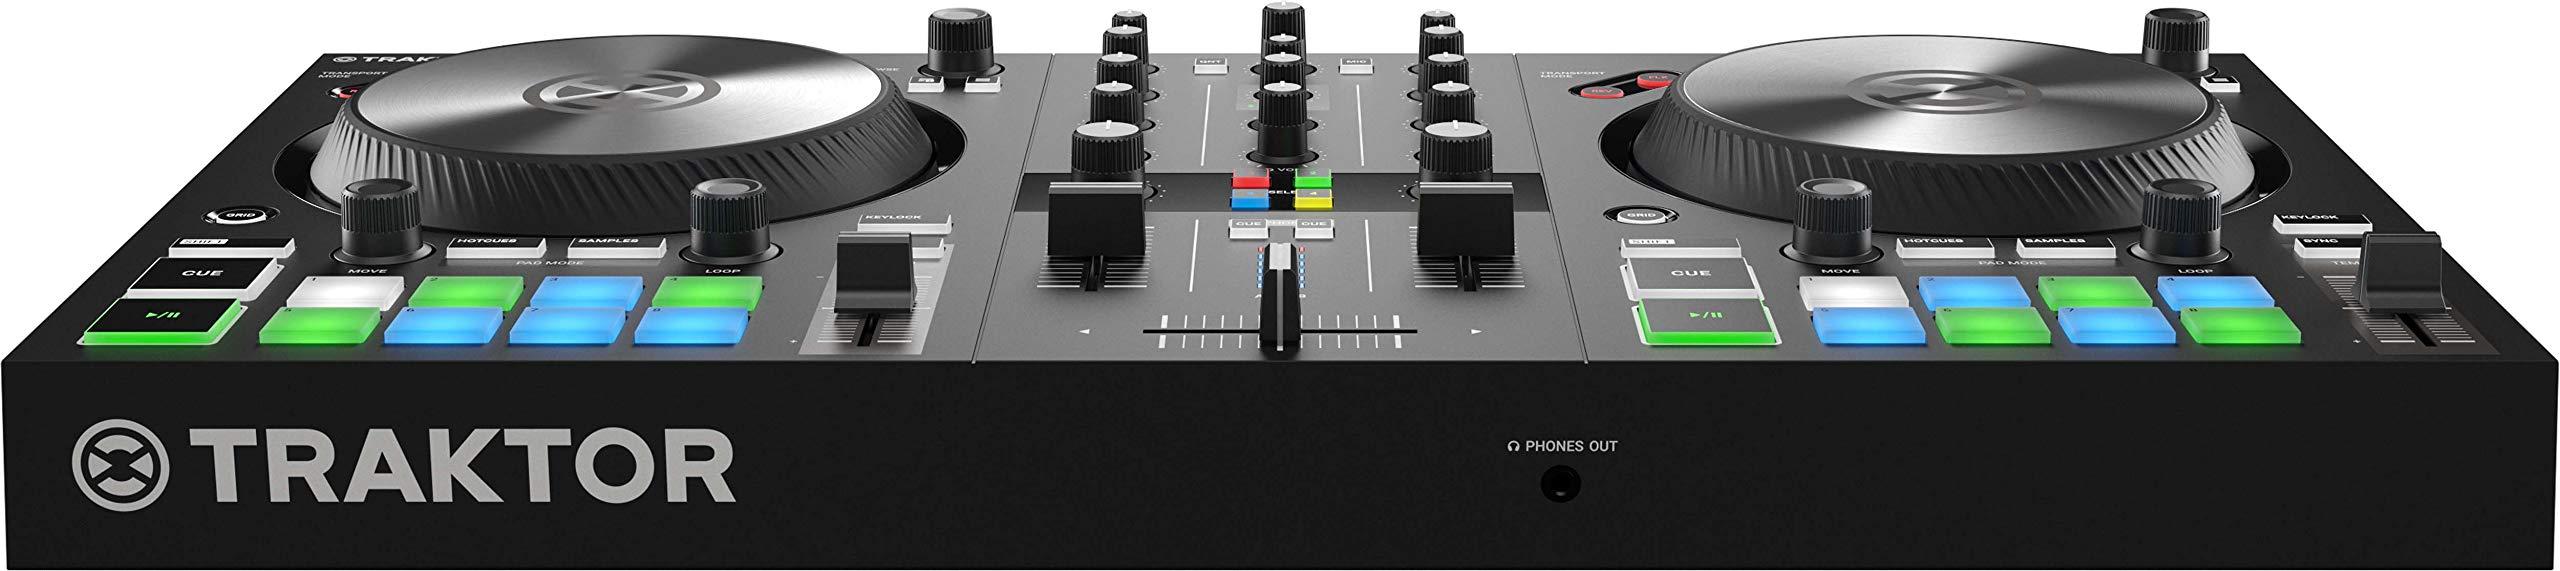 Native Instruments Traktor Kontrol S2 Mk3 DJ Controller by Native Instruments (Image #7)